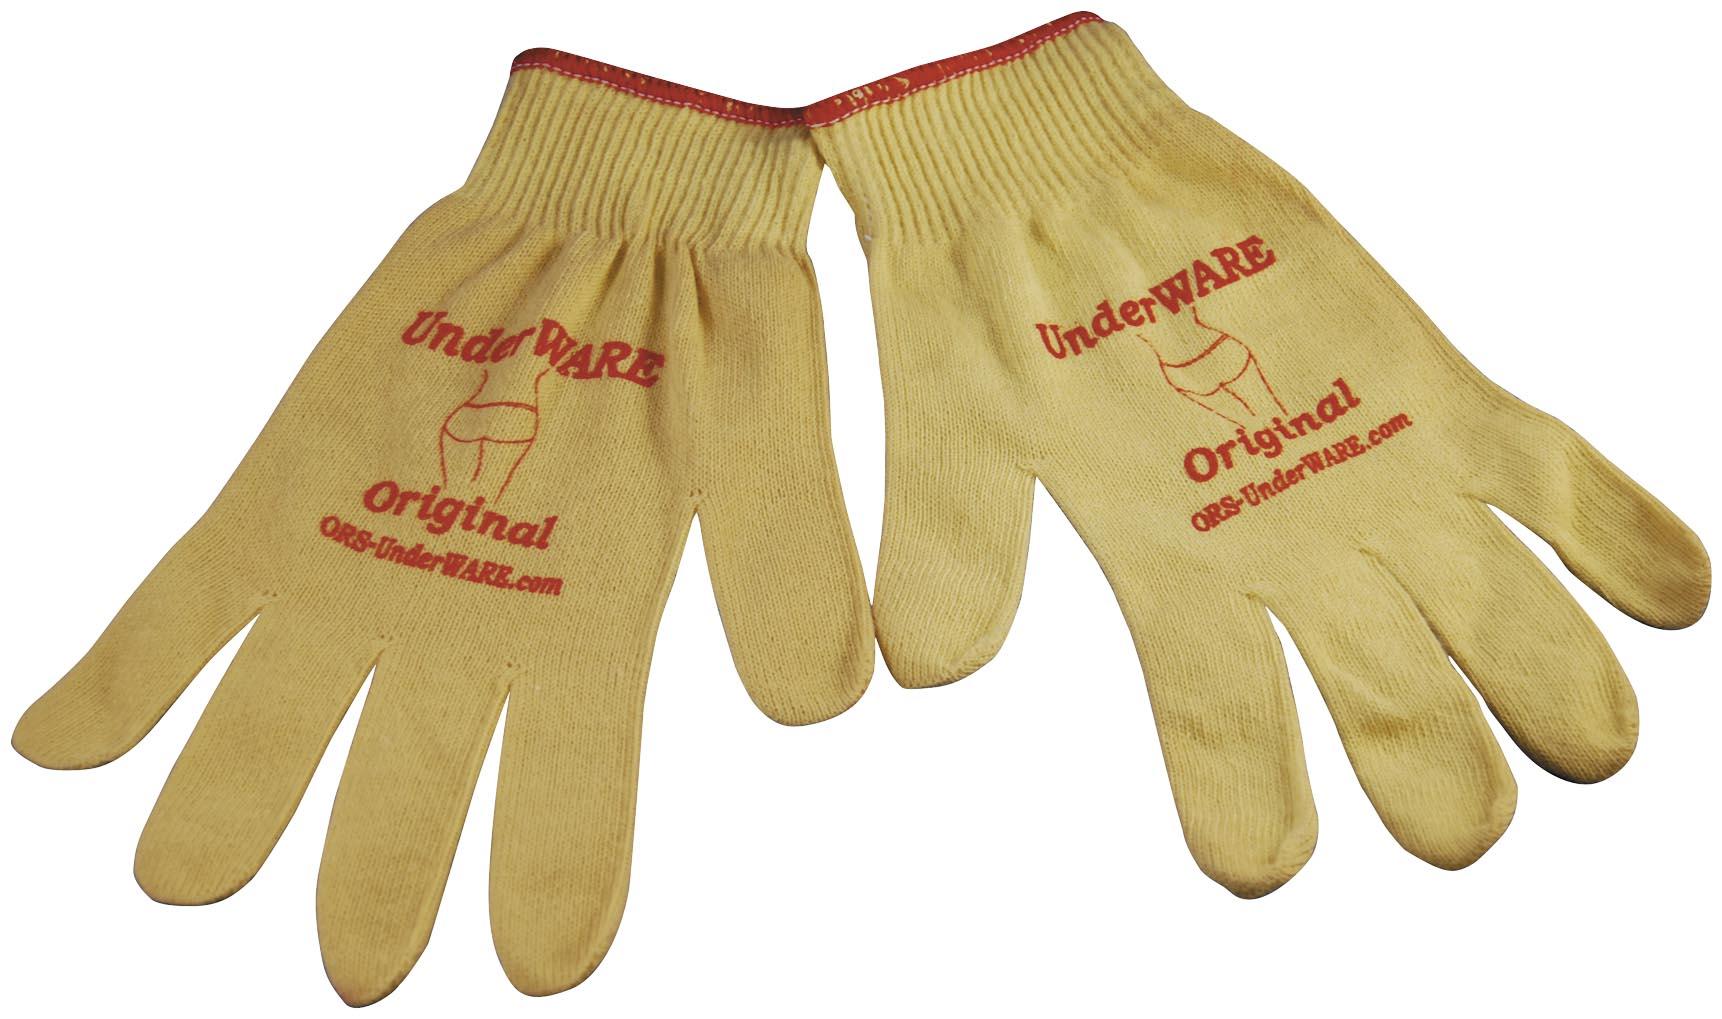 Original Glove Liners